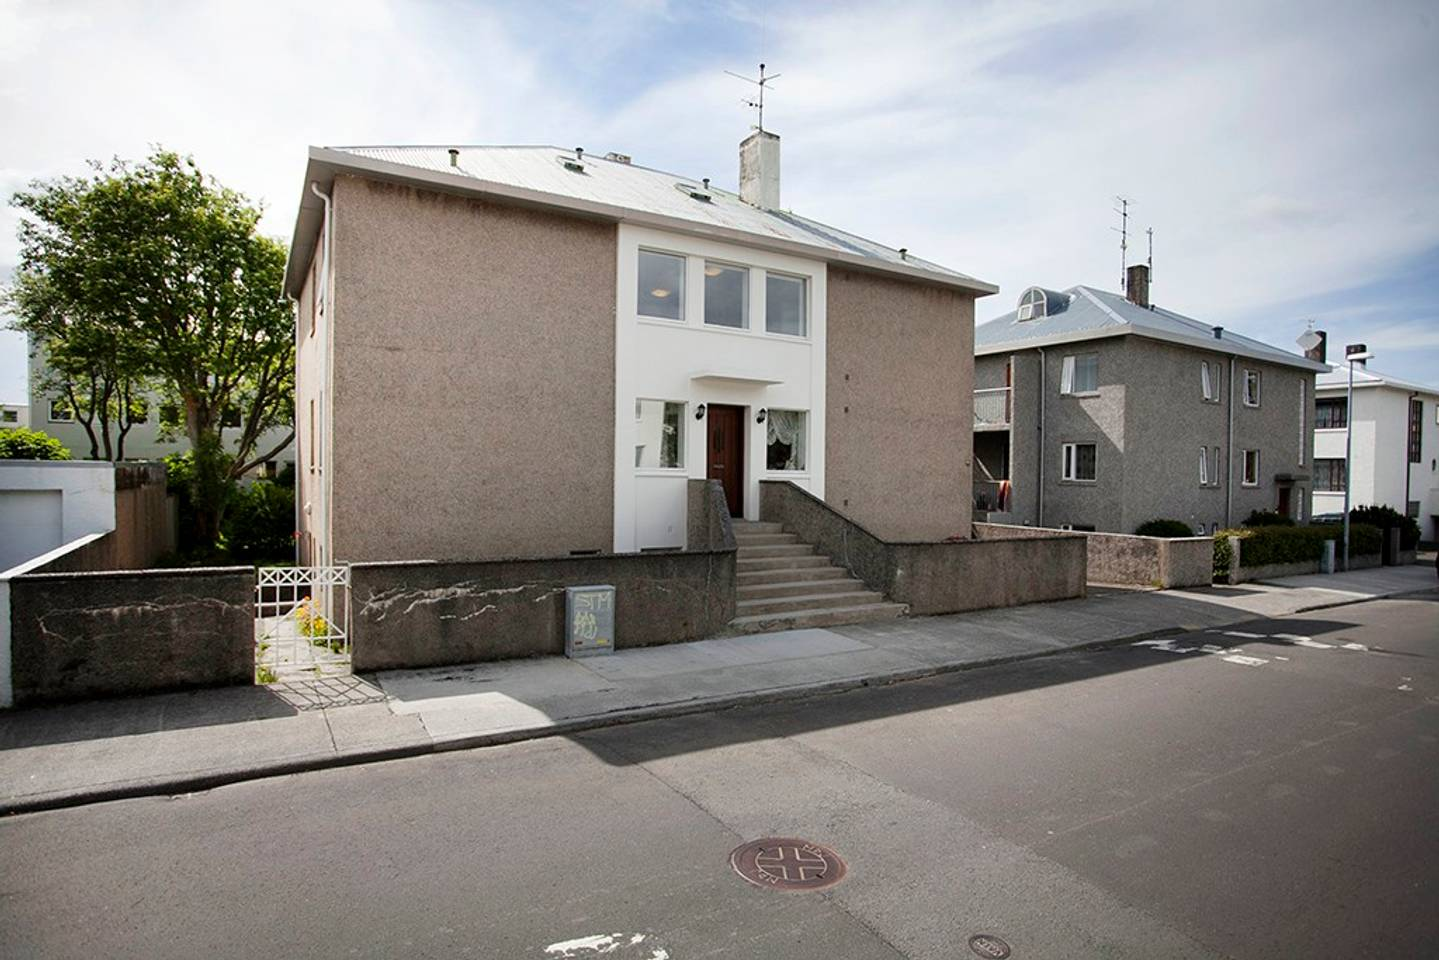 Apartment Luxury apartment central Reykjavik Iceland photo 16750214